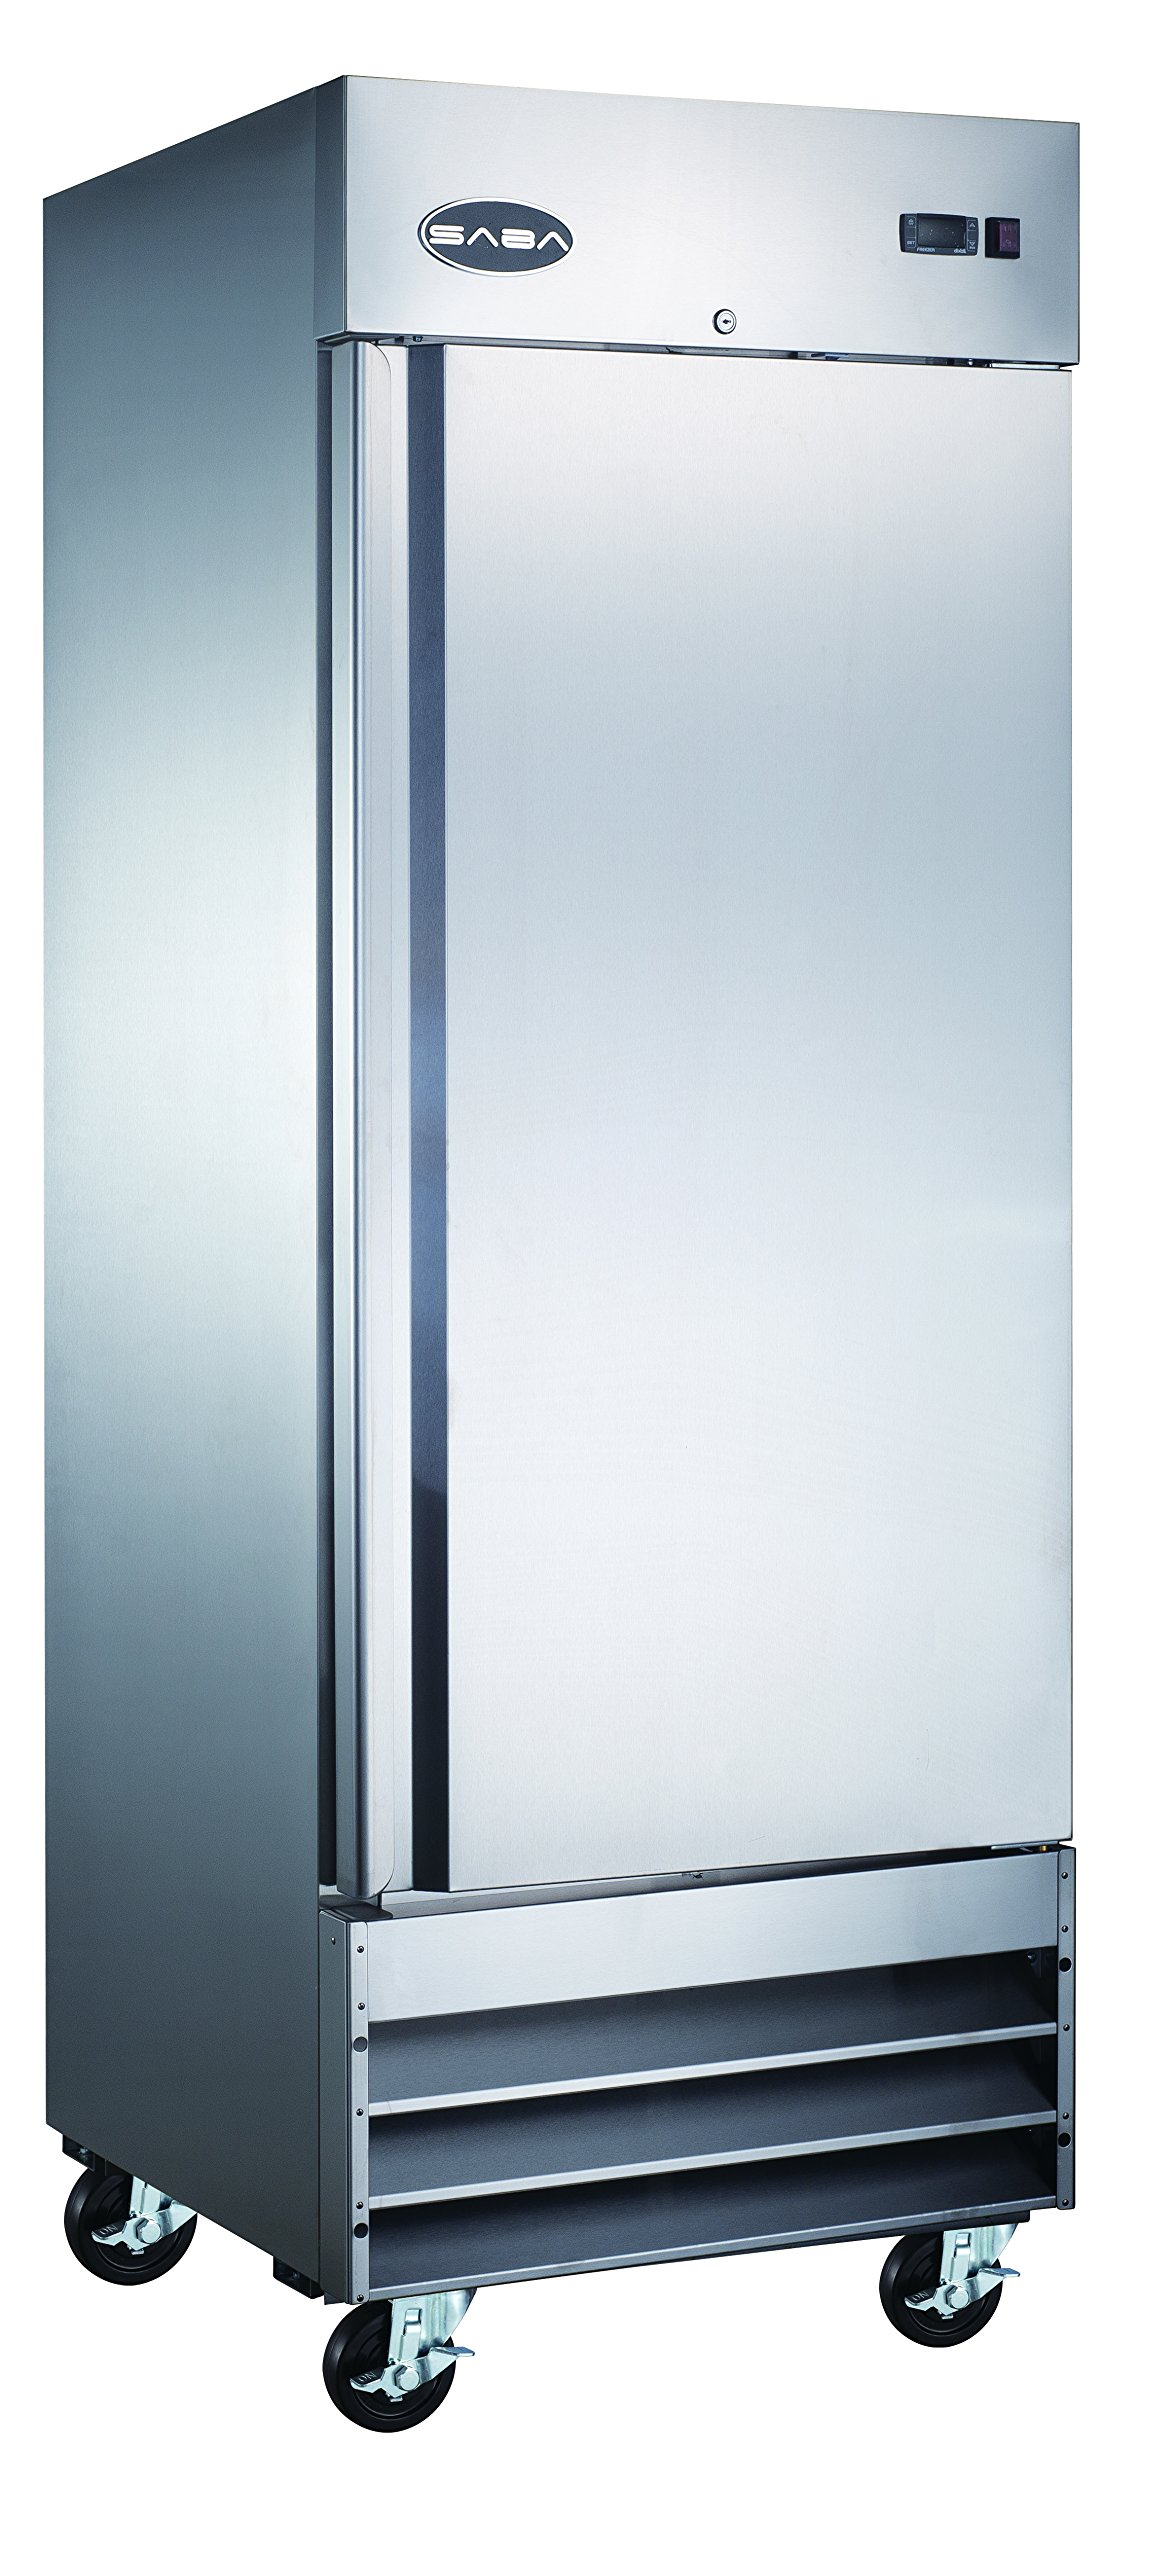 SABA One Solid Stainless Steel Door Reach-In Refrigerator by SABA Restaurant Utopia